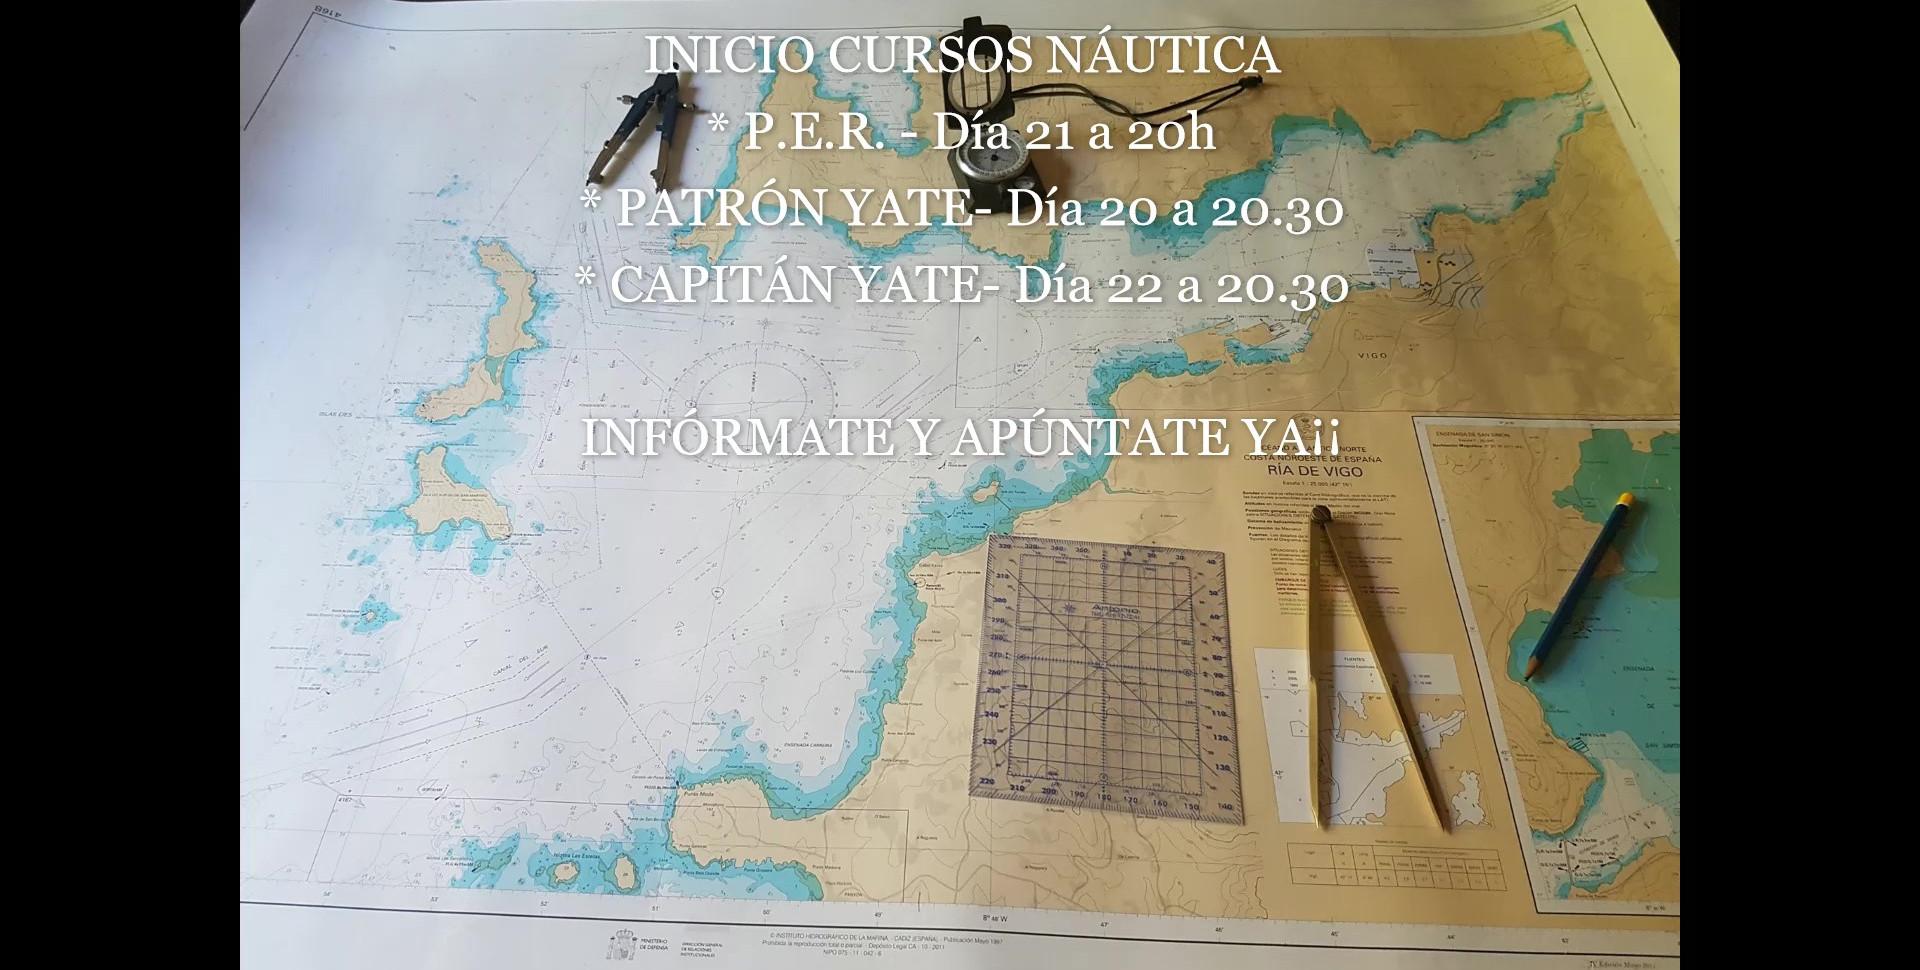 CURSOS DE NAUTICA3_Moment.jpg